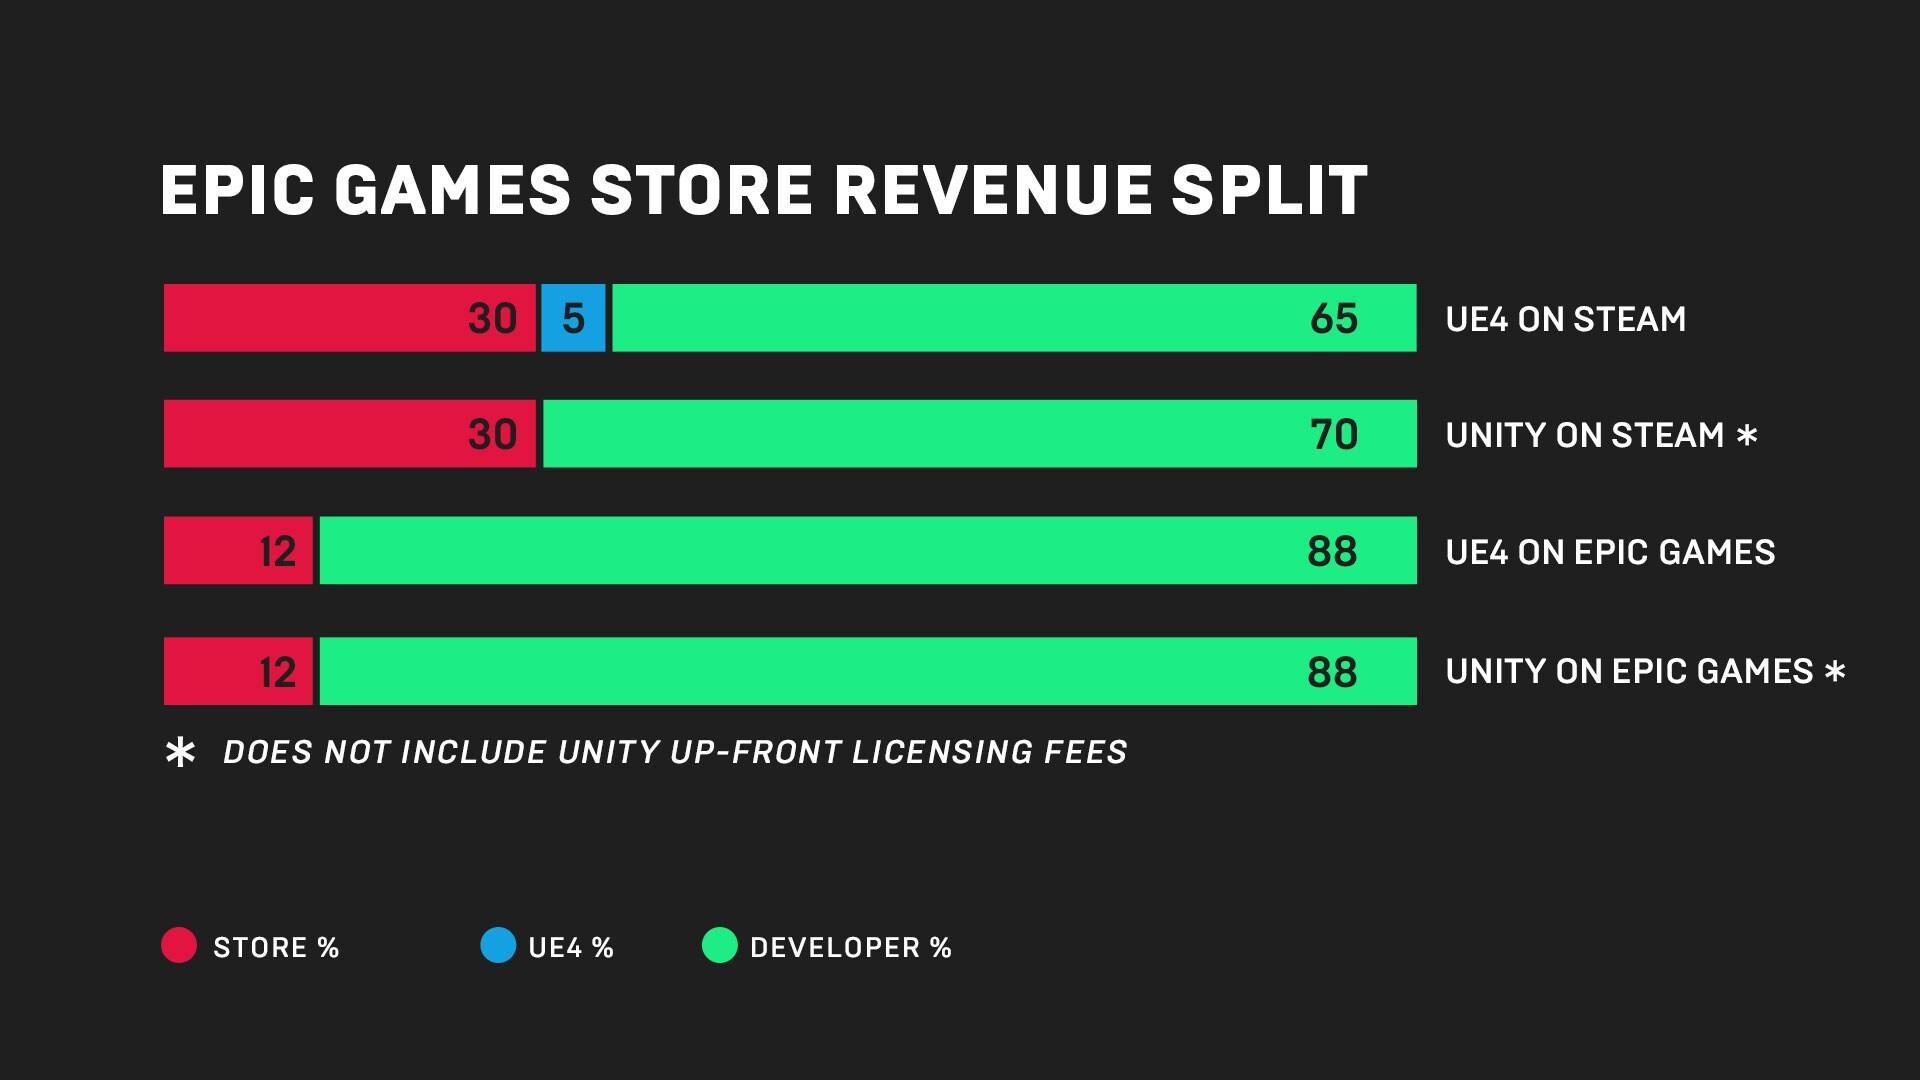 epci-games-store-2